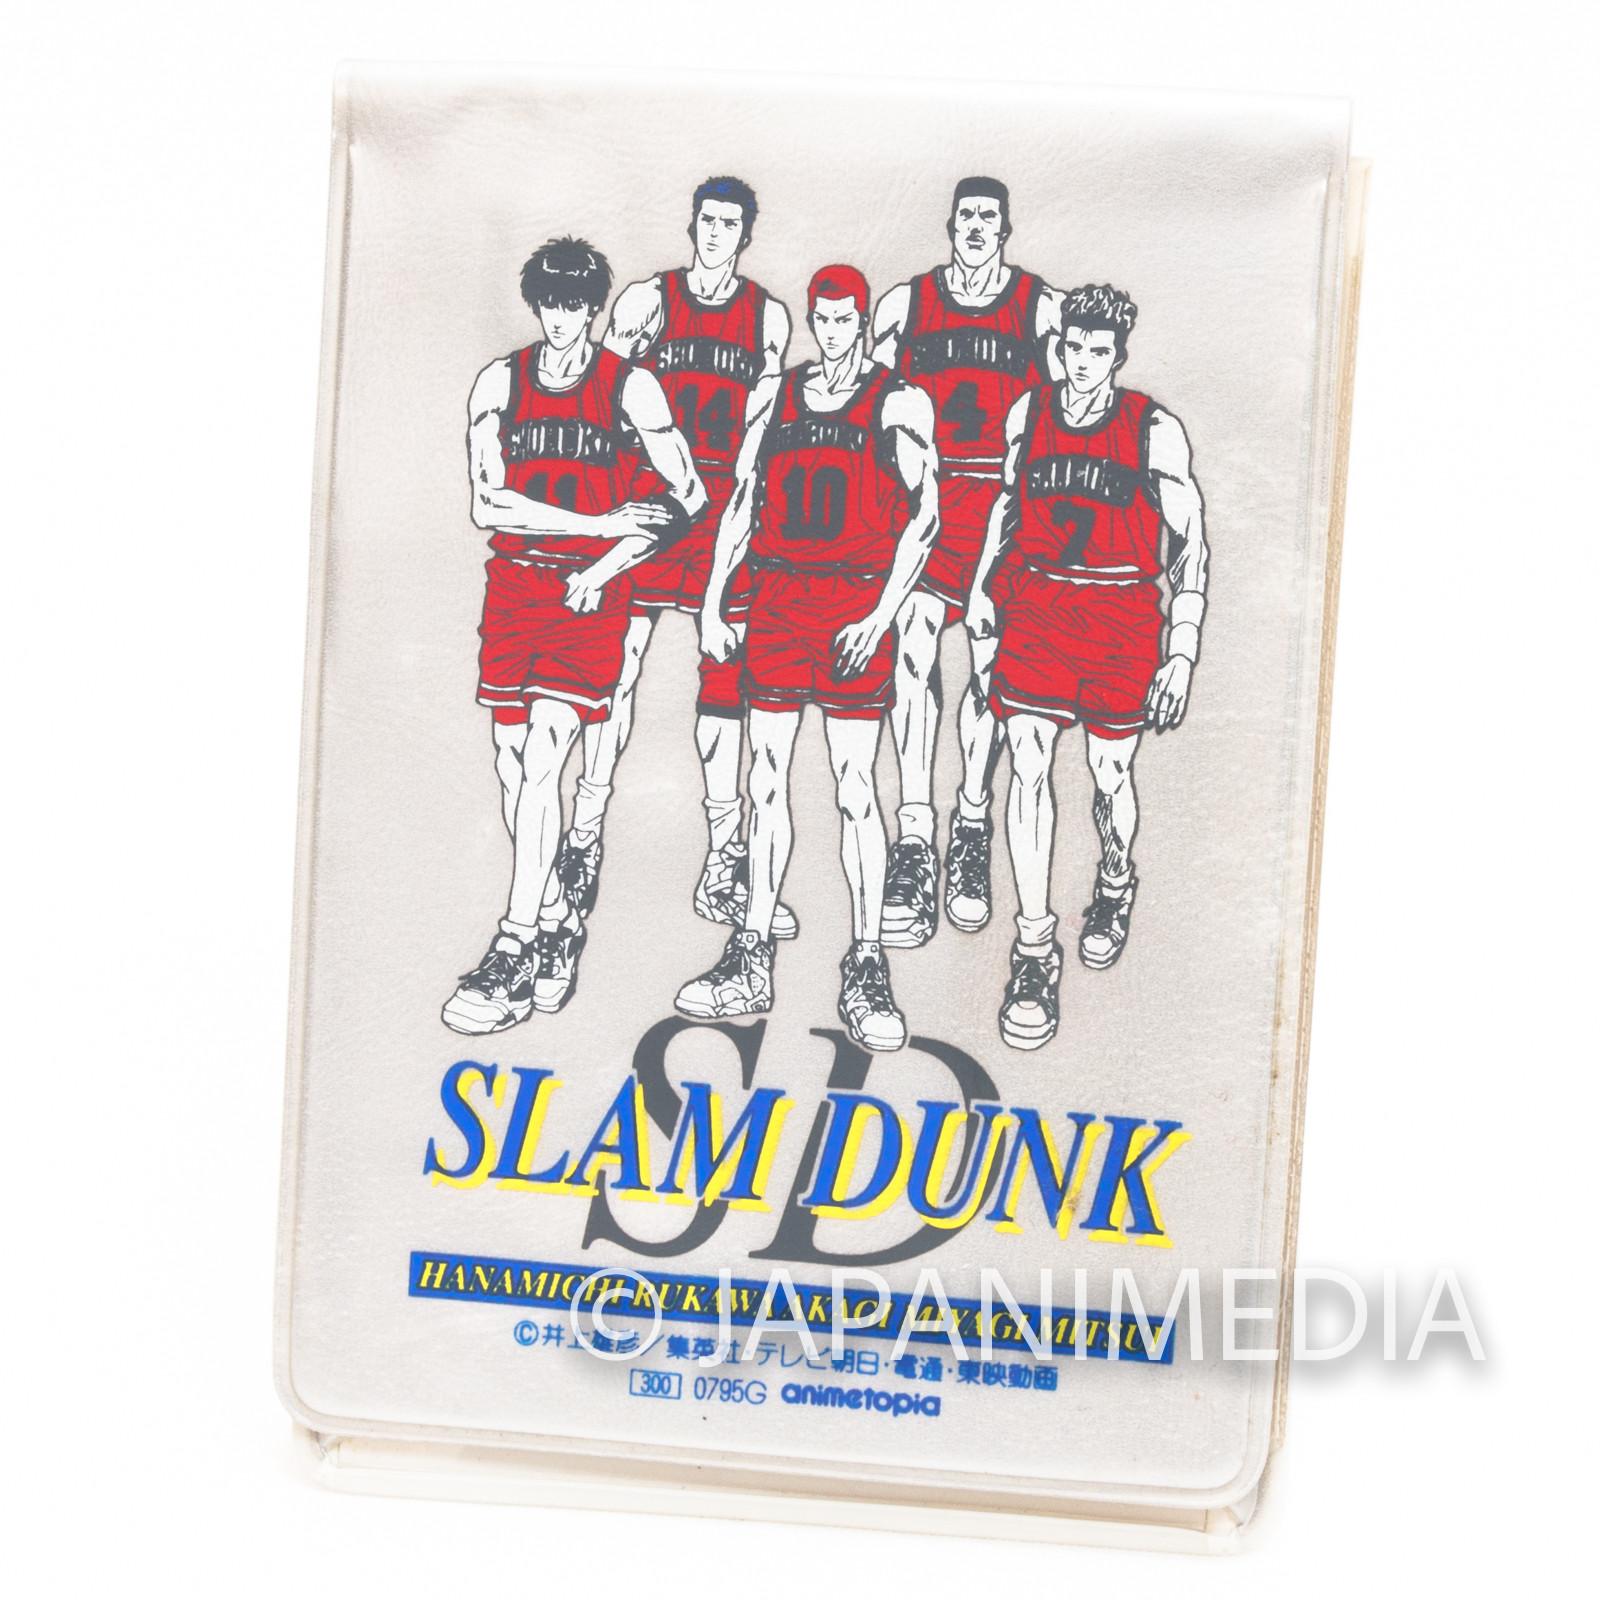 Slam Dunk Sakuragi Rukawa Akagi Mitsui Miyagi Pass Card Case Holder